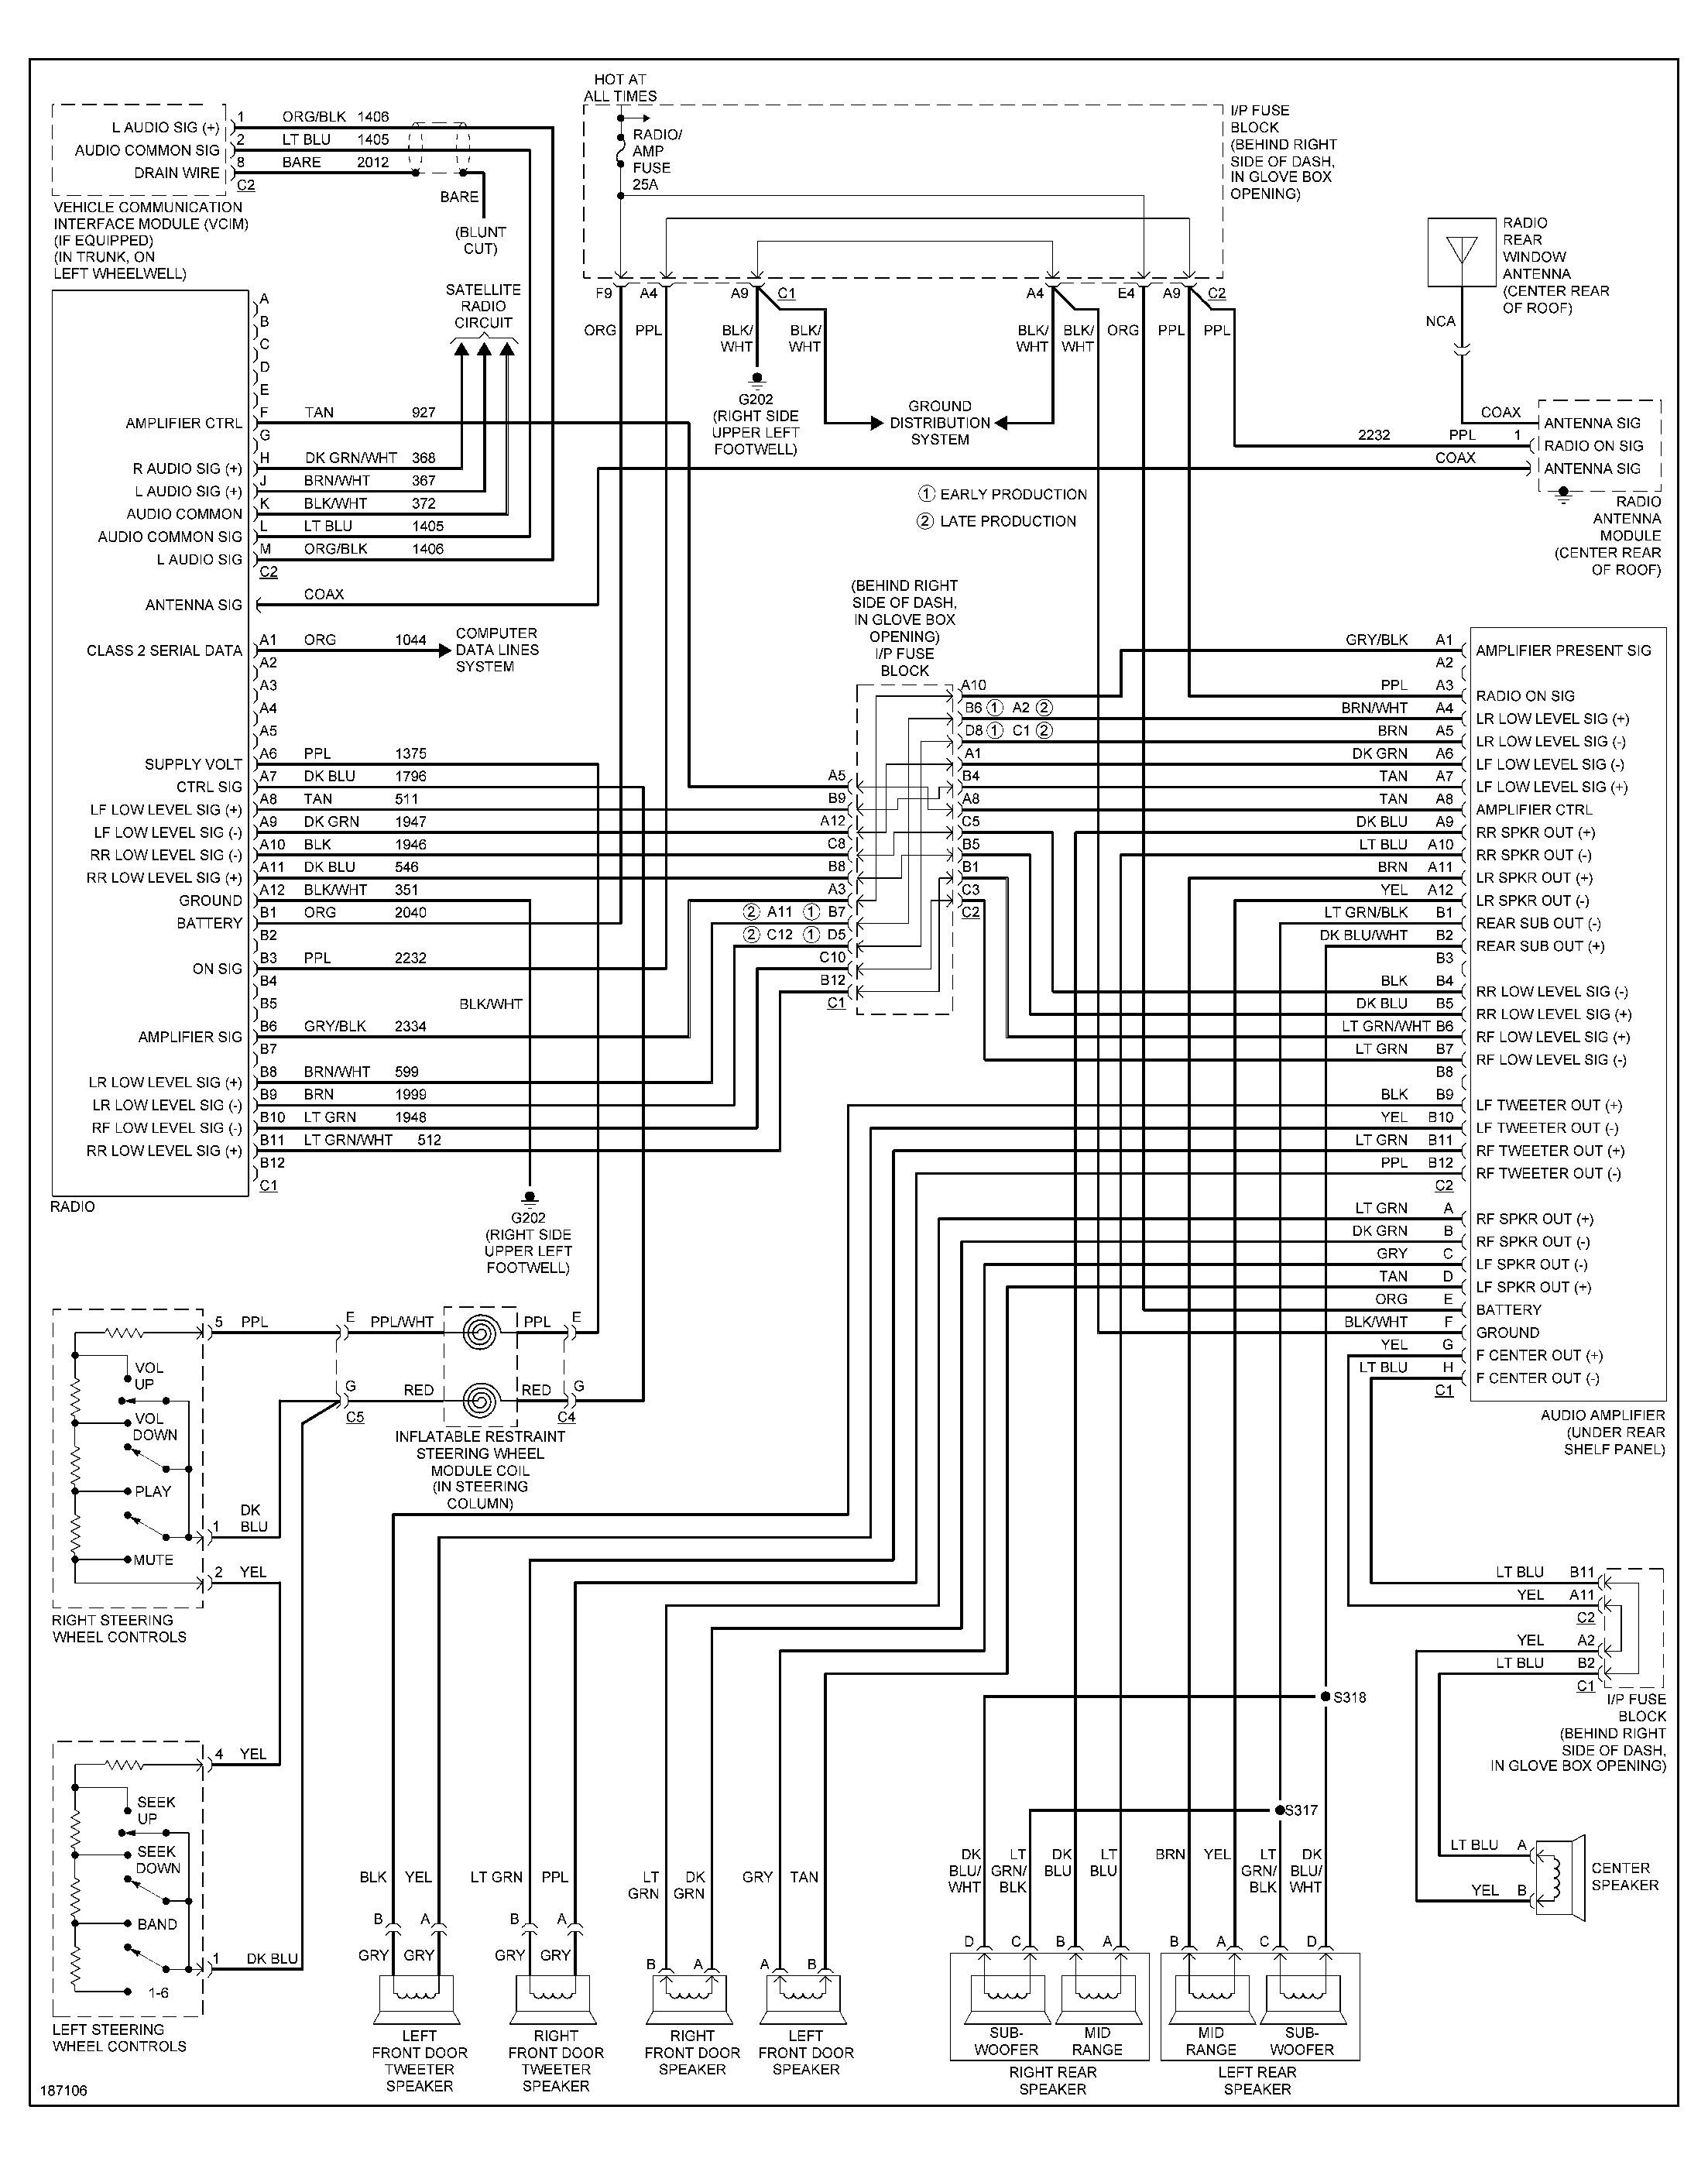 1992 toyota Paseo Engine Diagram 1992 Pontiac Grand Am Engine Diagram Wiring Schematic Worksheet Of 1992 toyota Paseo Engine Diagram